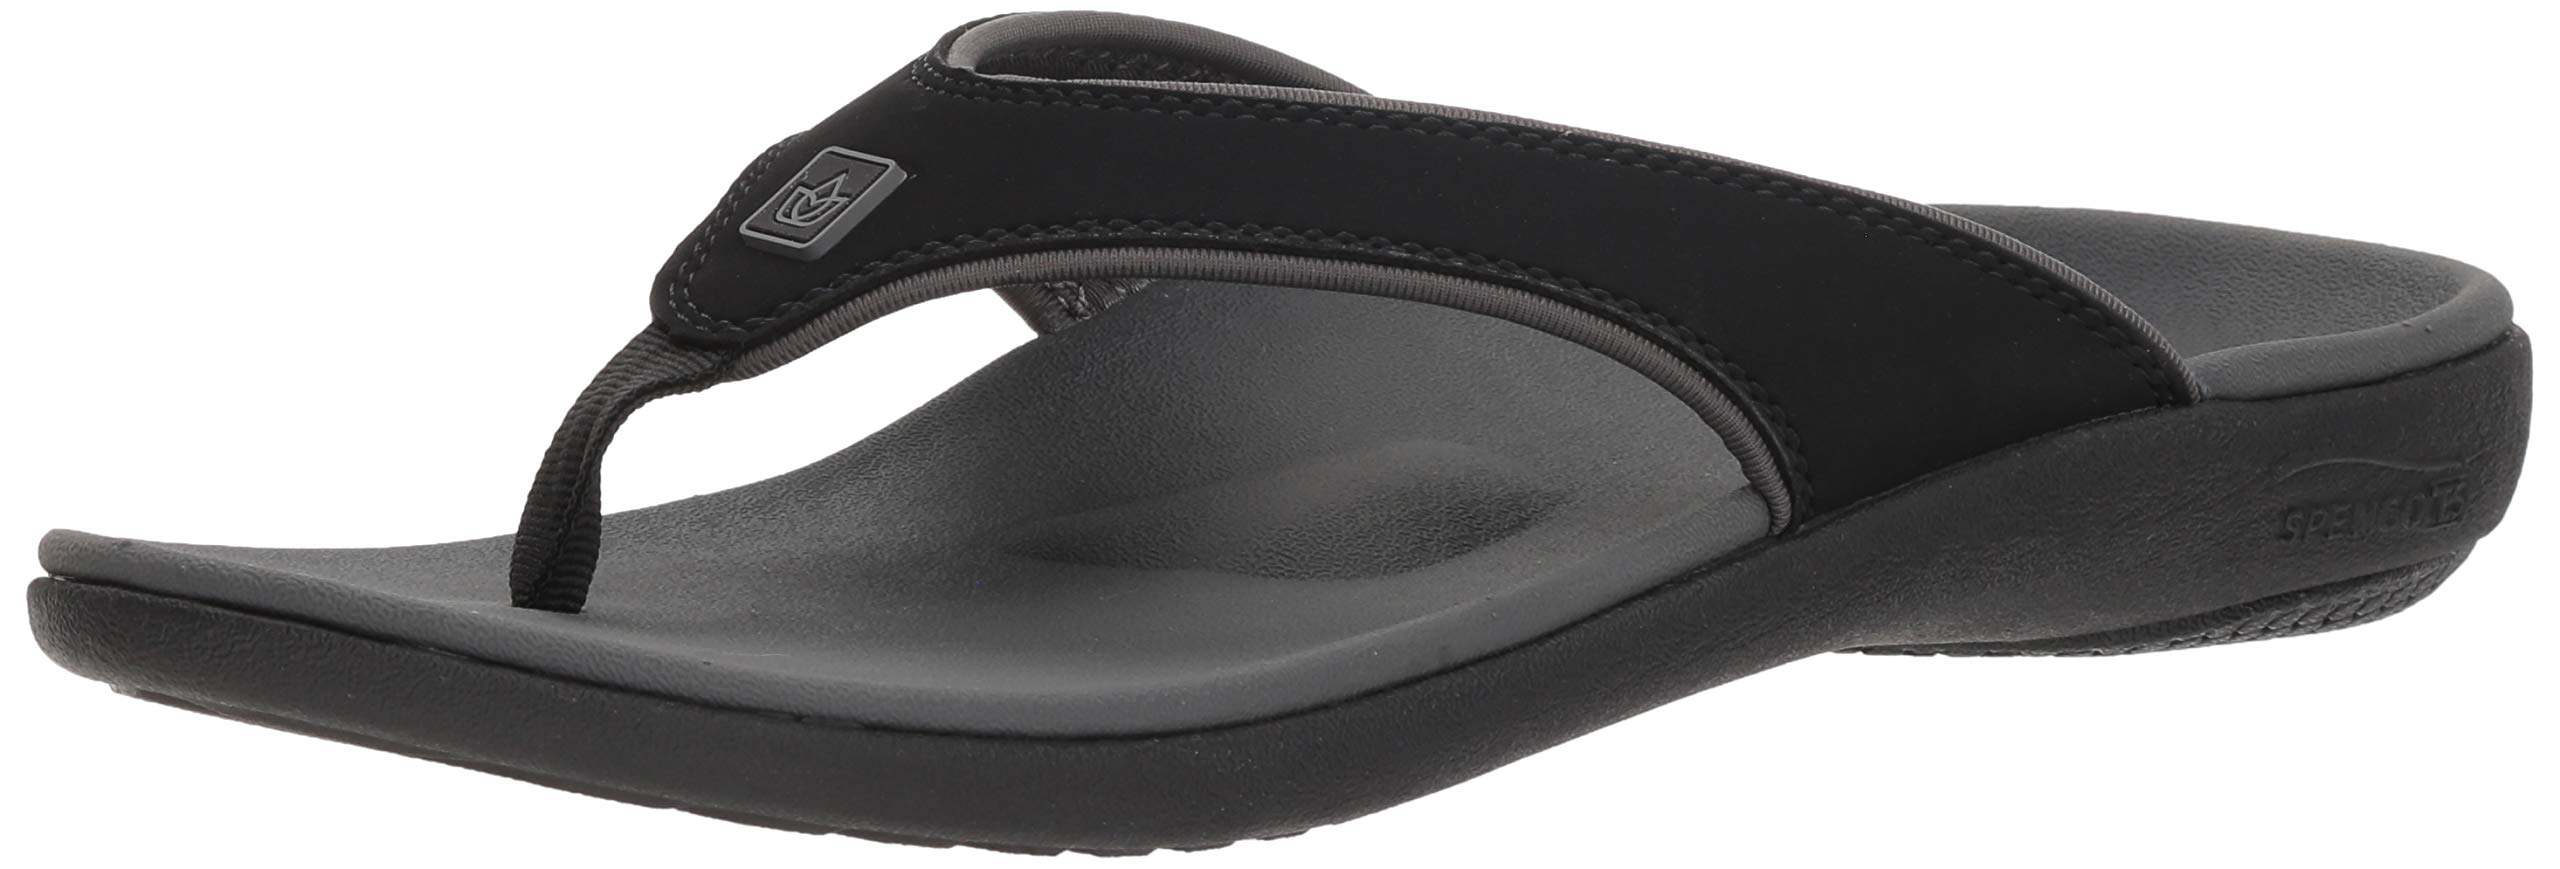 Spenco Men's Yumi Plus Sandal Sandal, Carbon/Pewter, 8 Wide US by Spenco (Image #1)